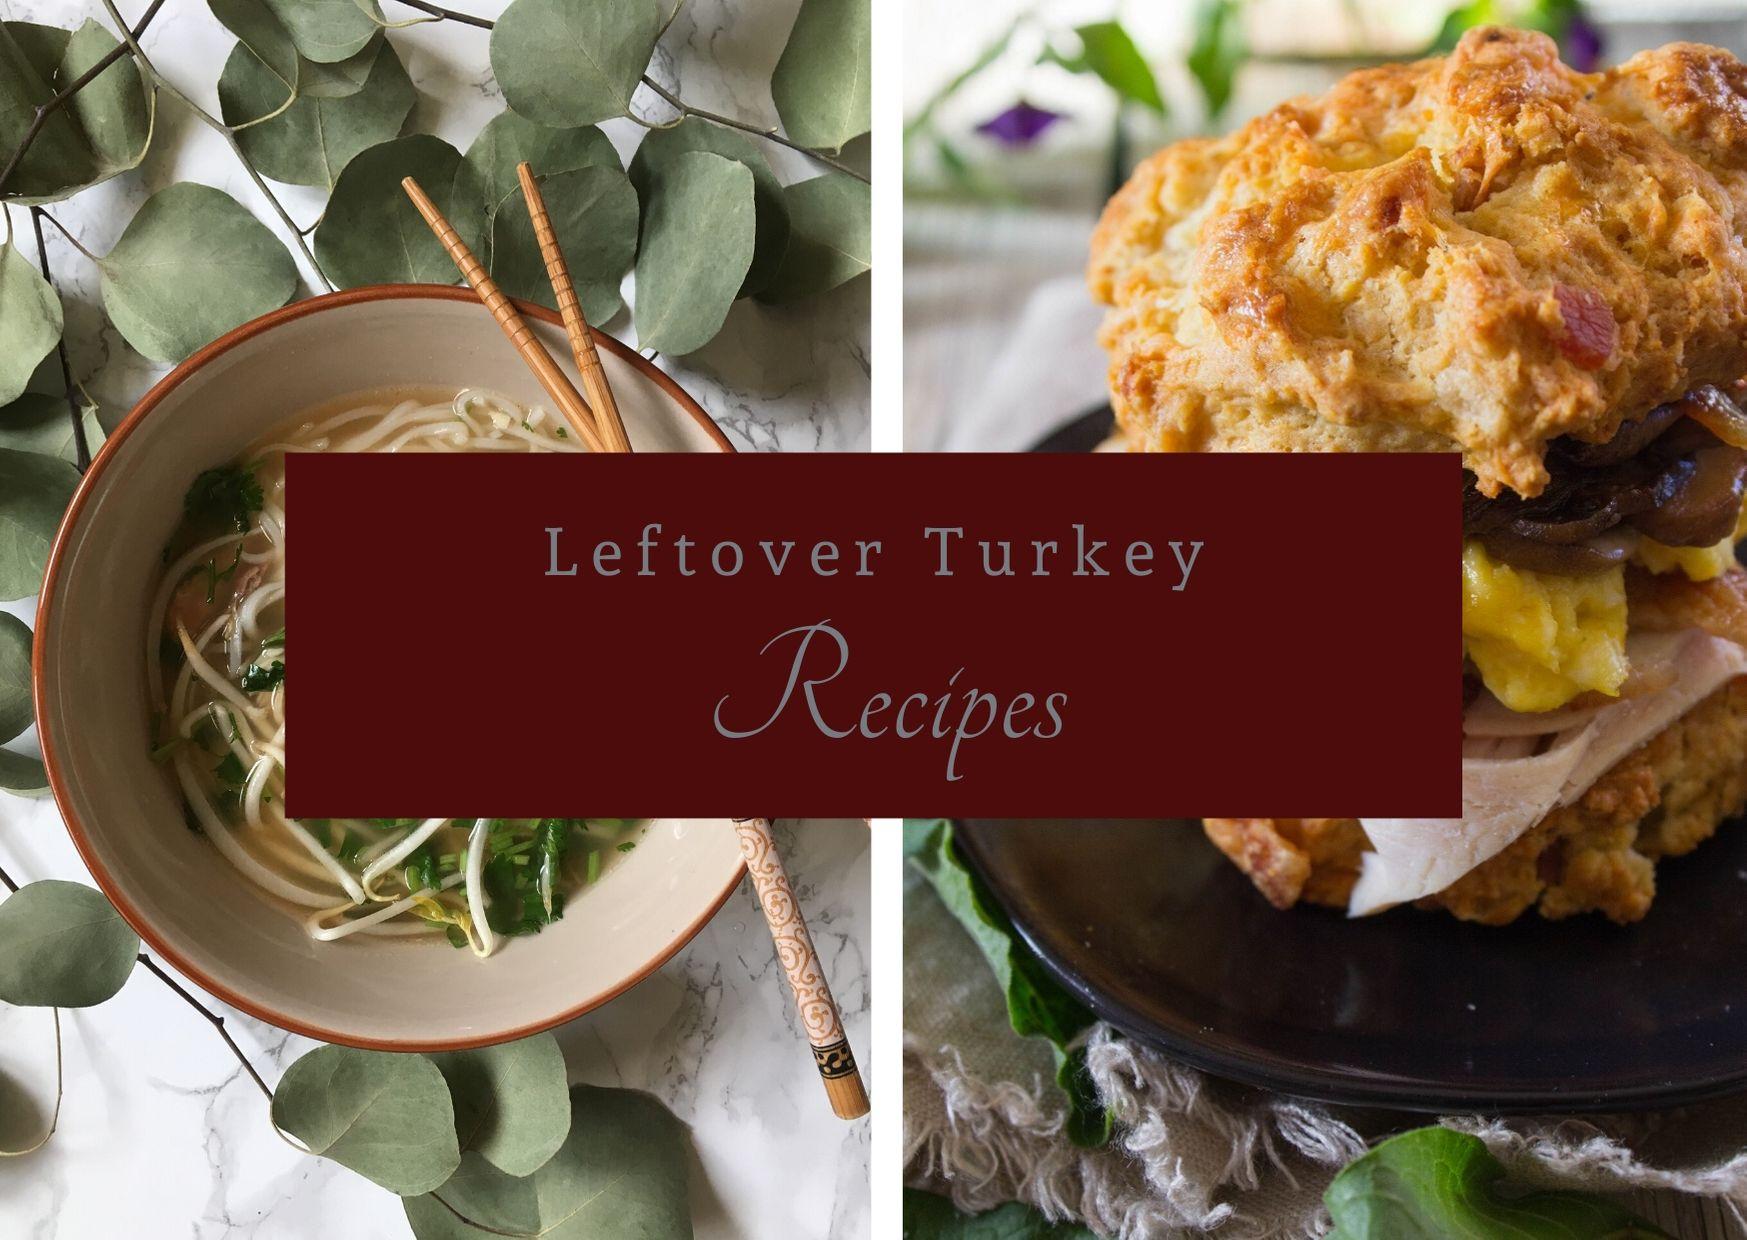 Leftover Turkey Recipes 2019